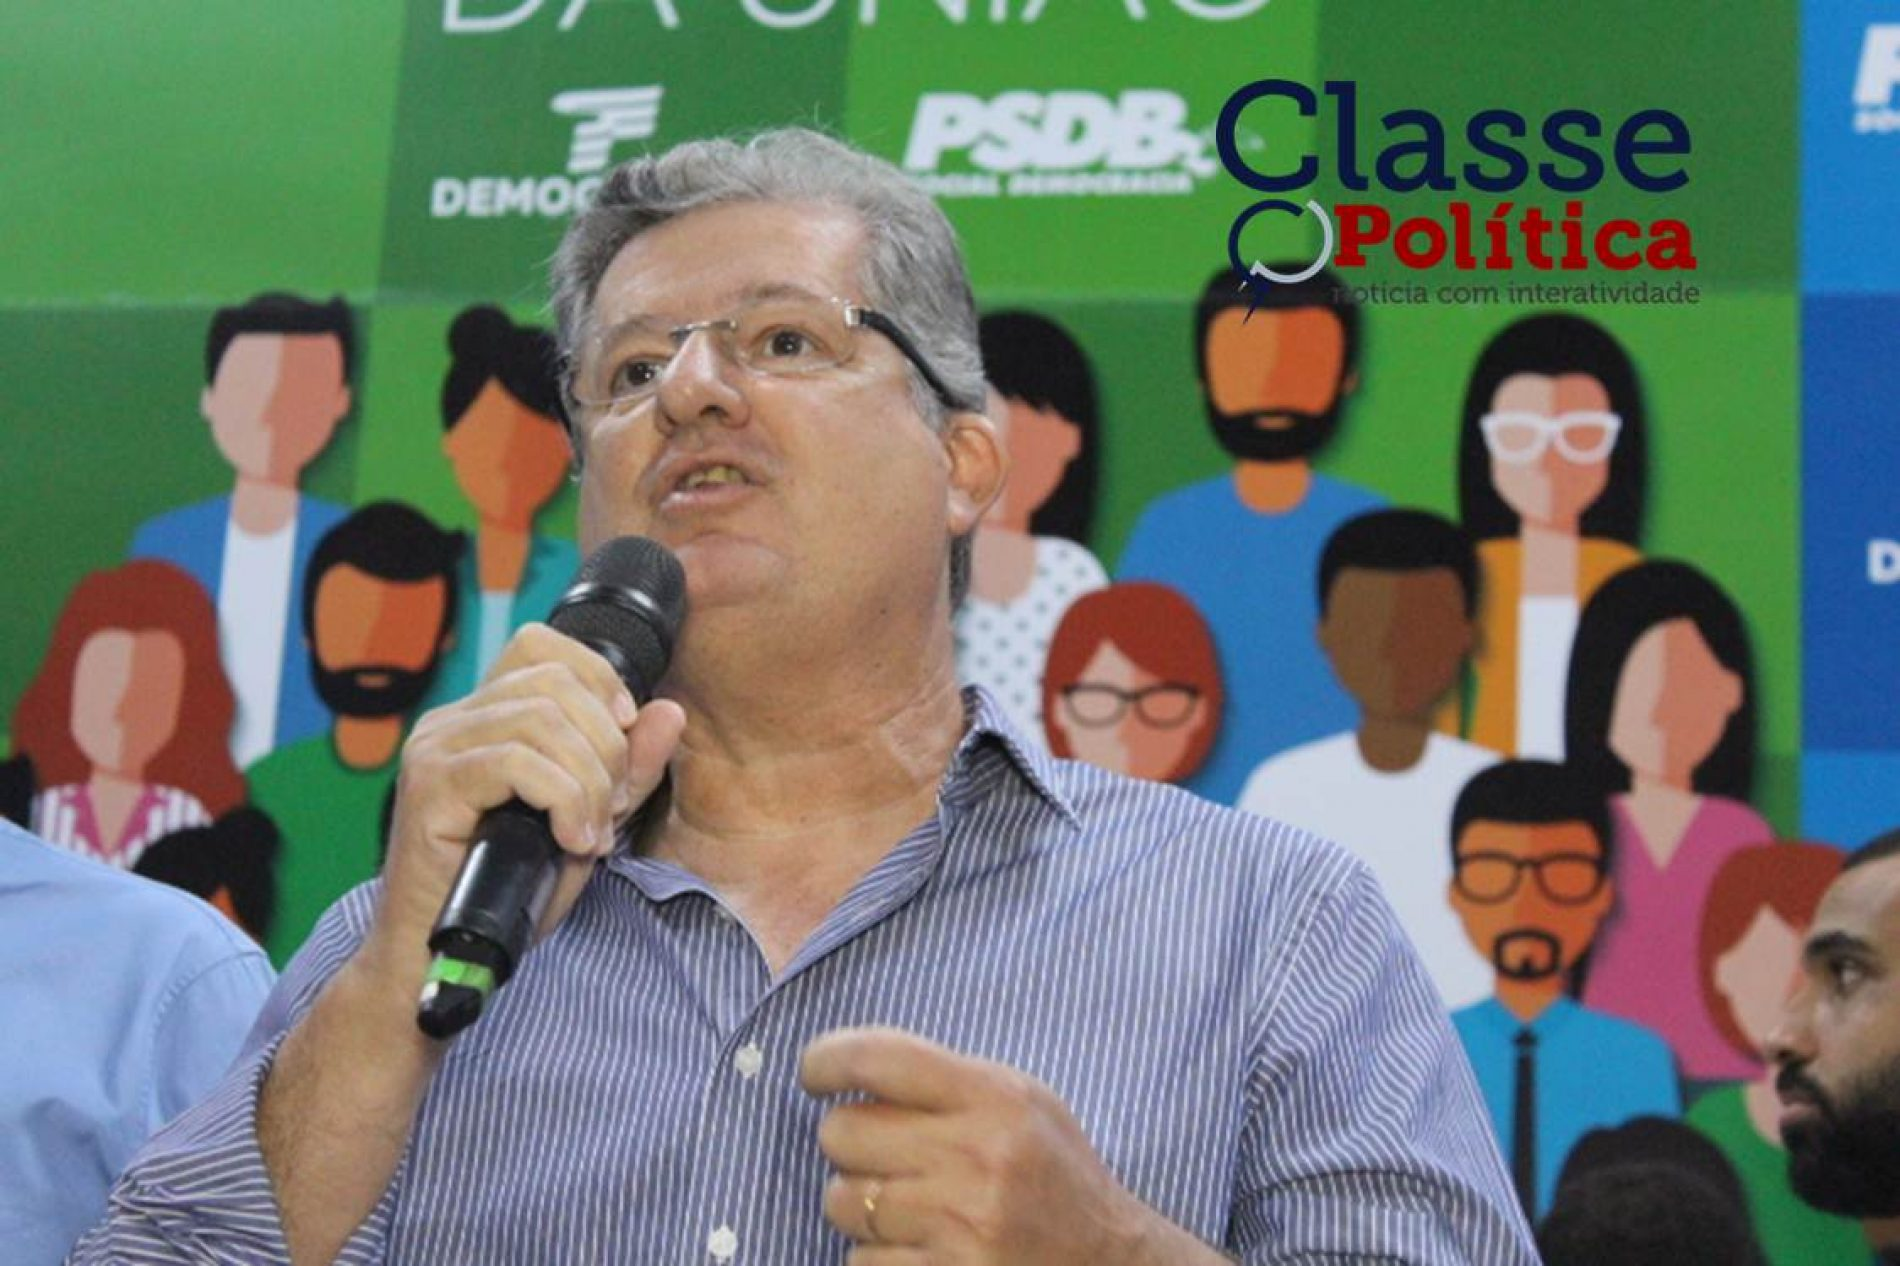 "VÍDEO.""Conseguir recursos para quase todos os municípios da Bahia"", revela o pré-candidato ao senado Jutahy Magalhães Jr."